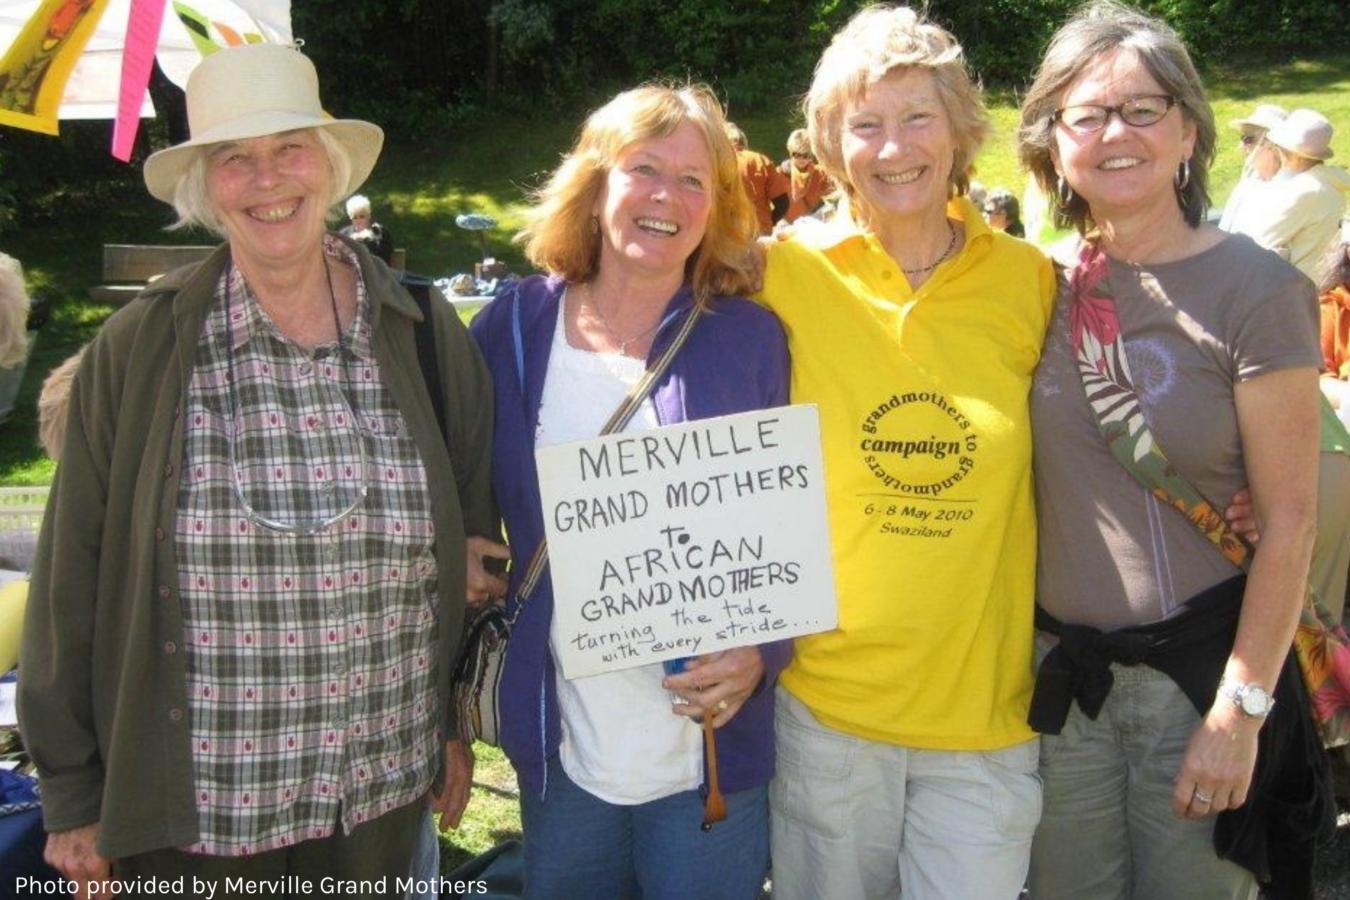 Merville Grand Mothers